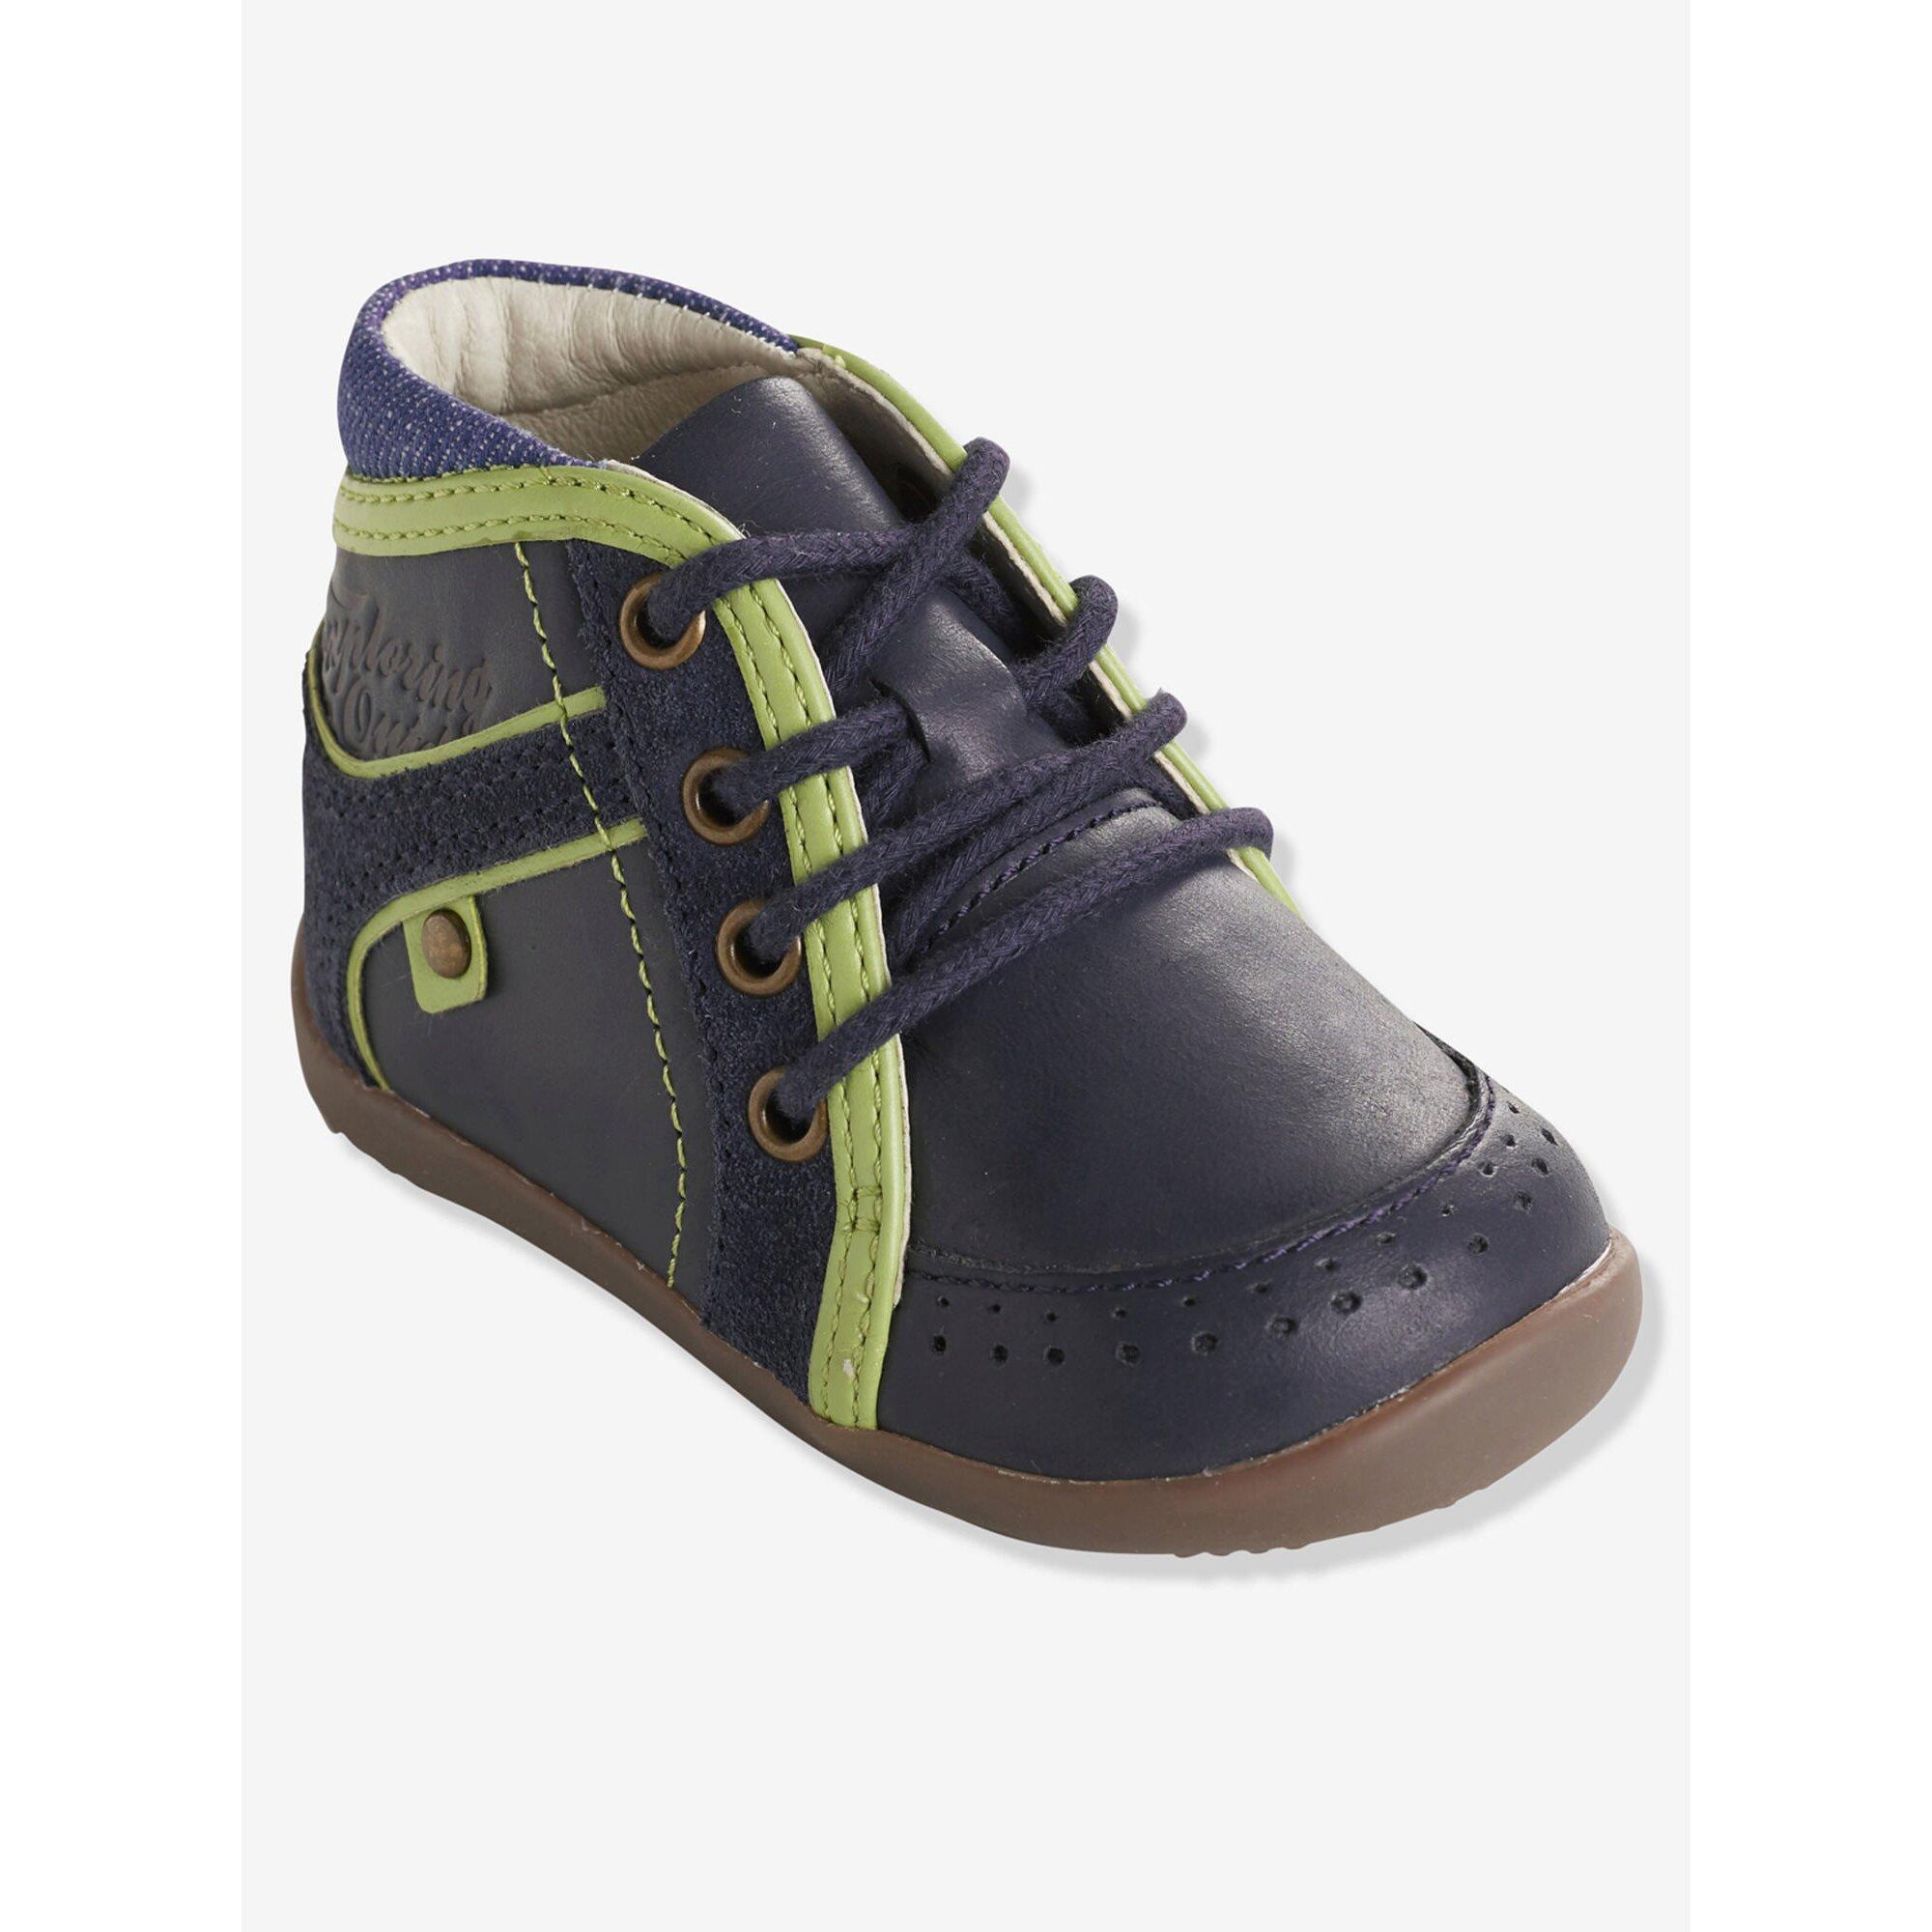 vertbaudet-leder-boots-fur-jungen-lauflernschuhe, 50.99 EUR @ babywalz-de